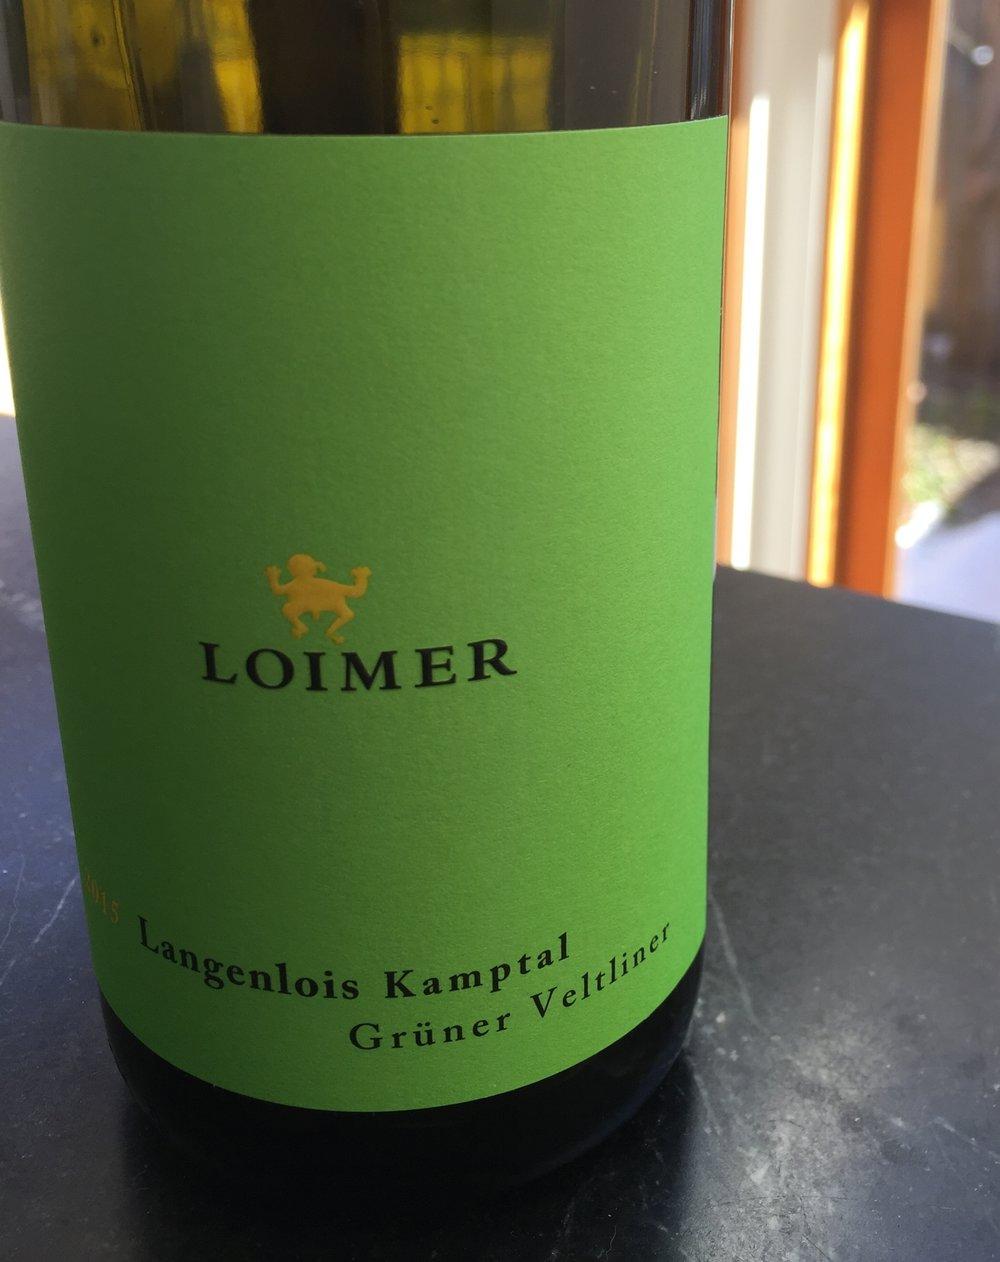 Loimer Gruner Veltliner Langenlois Kamptal 2015 review